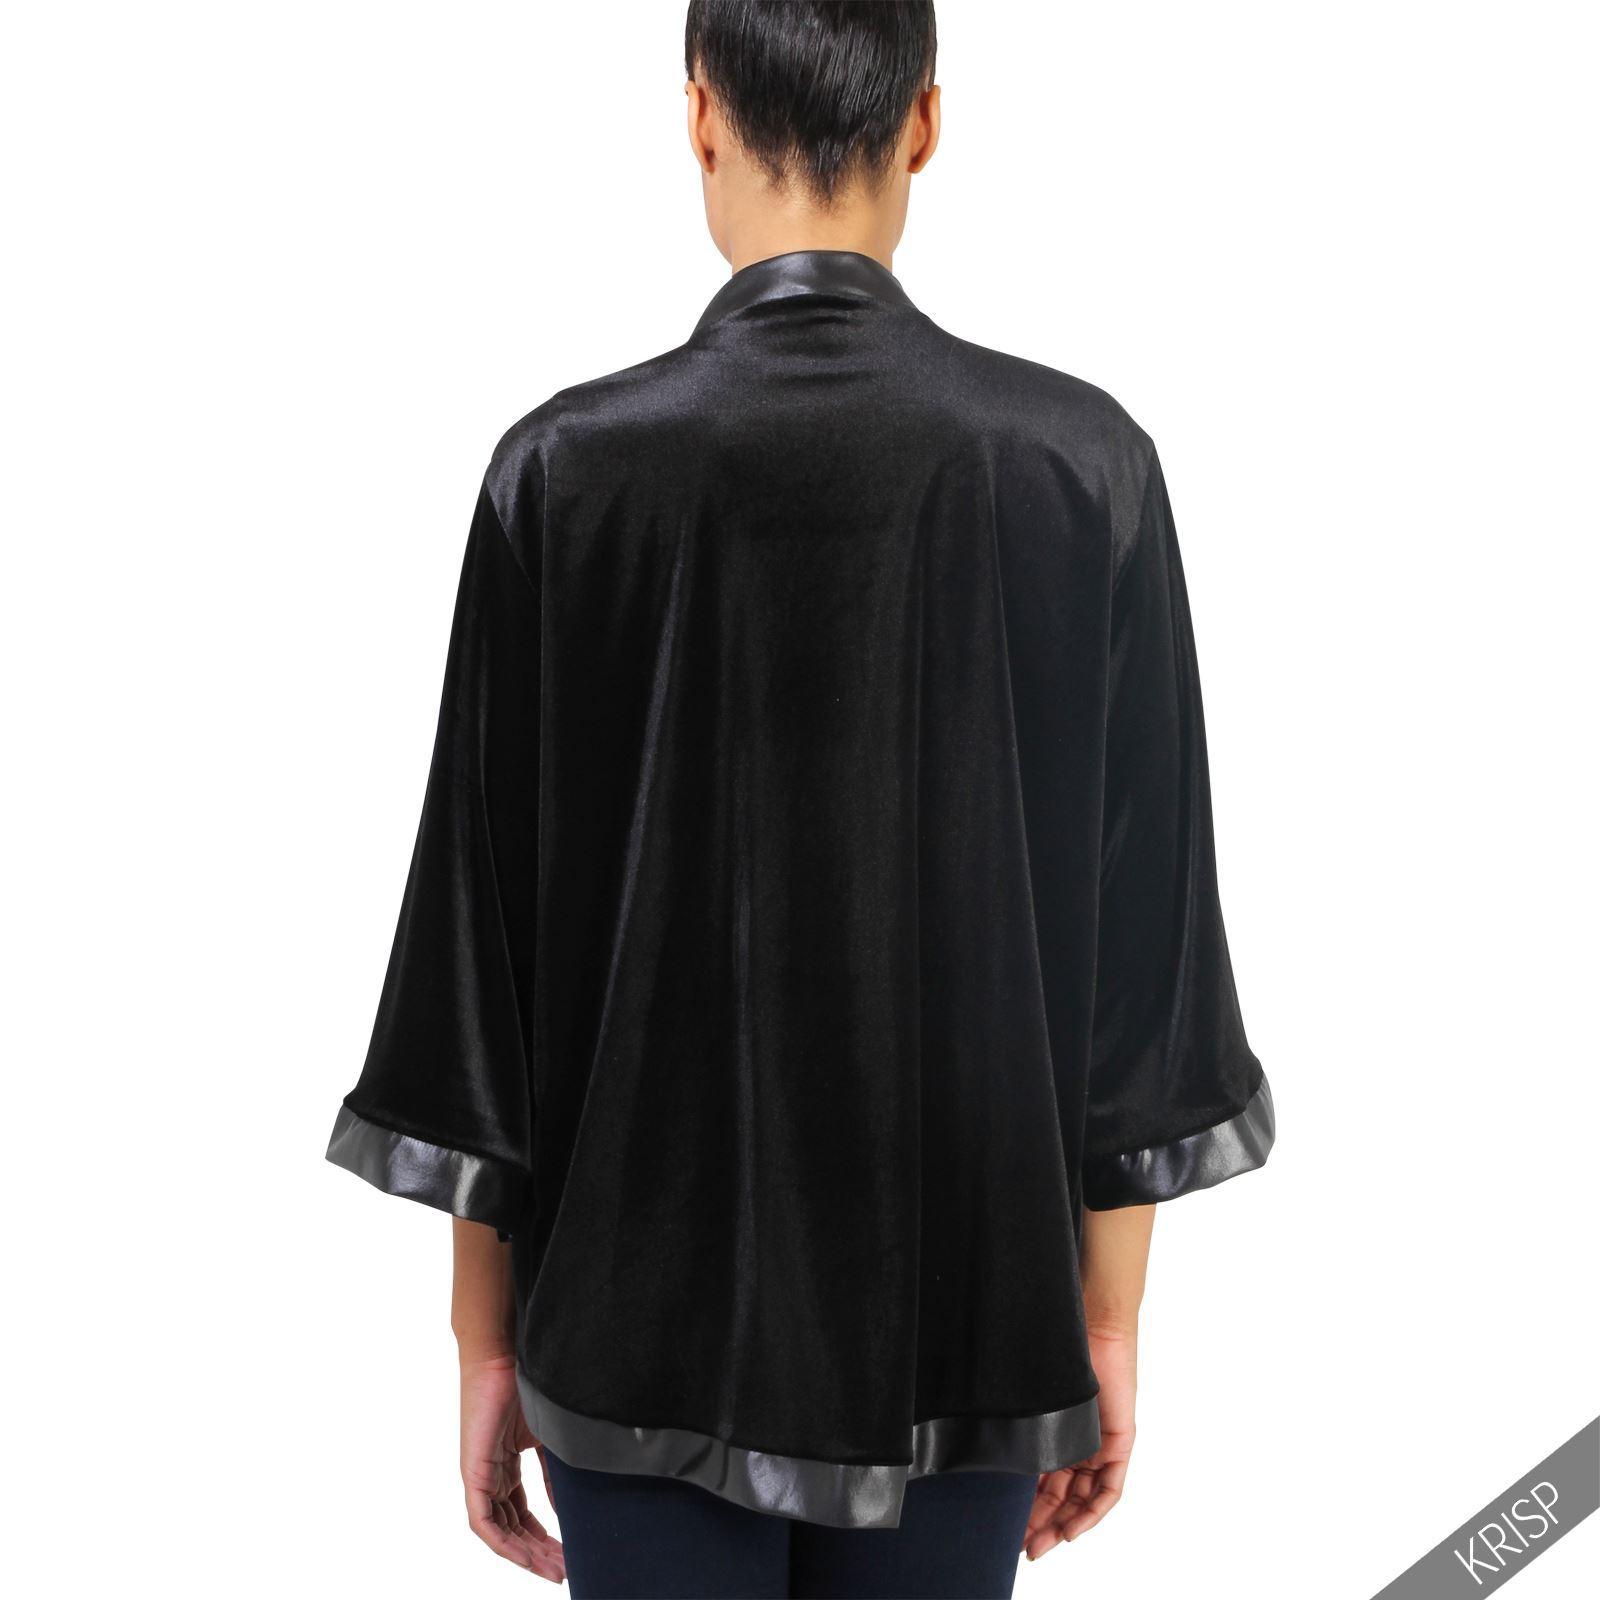 damen offene samt satin jacke 3 4 arm kimono bluse blazer. Black Bedroom Furniture Sets. Home Design Ideas